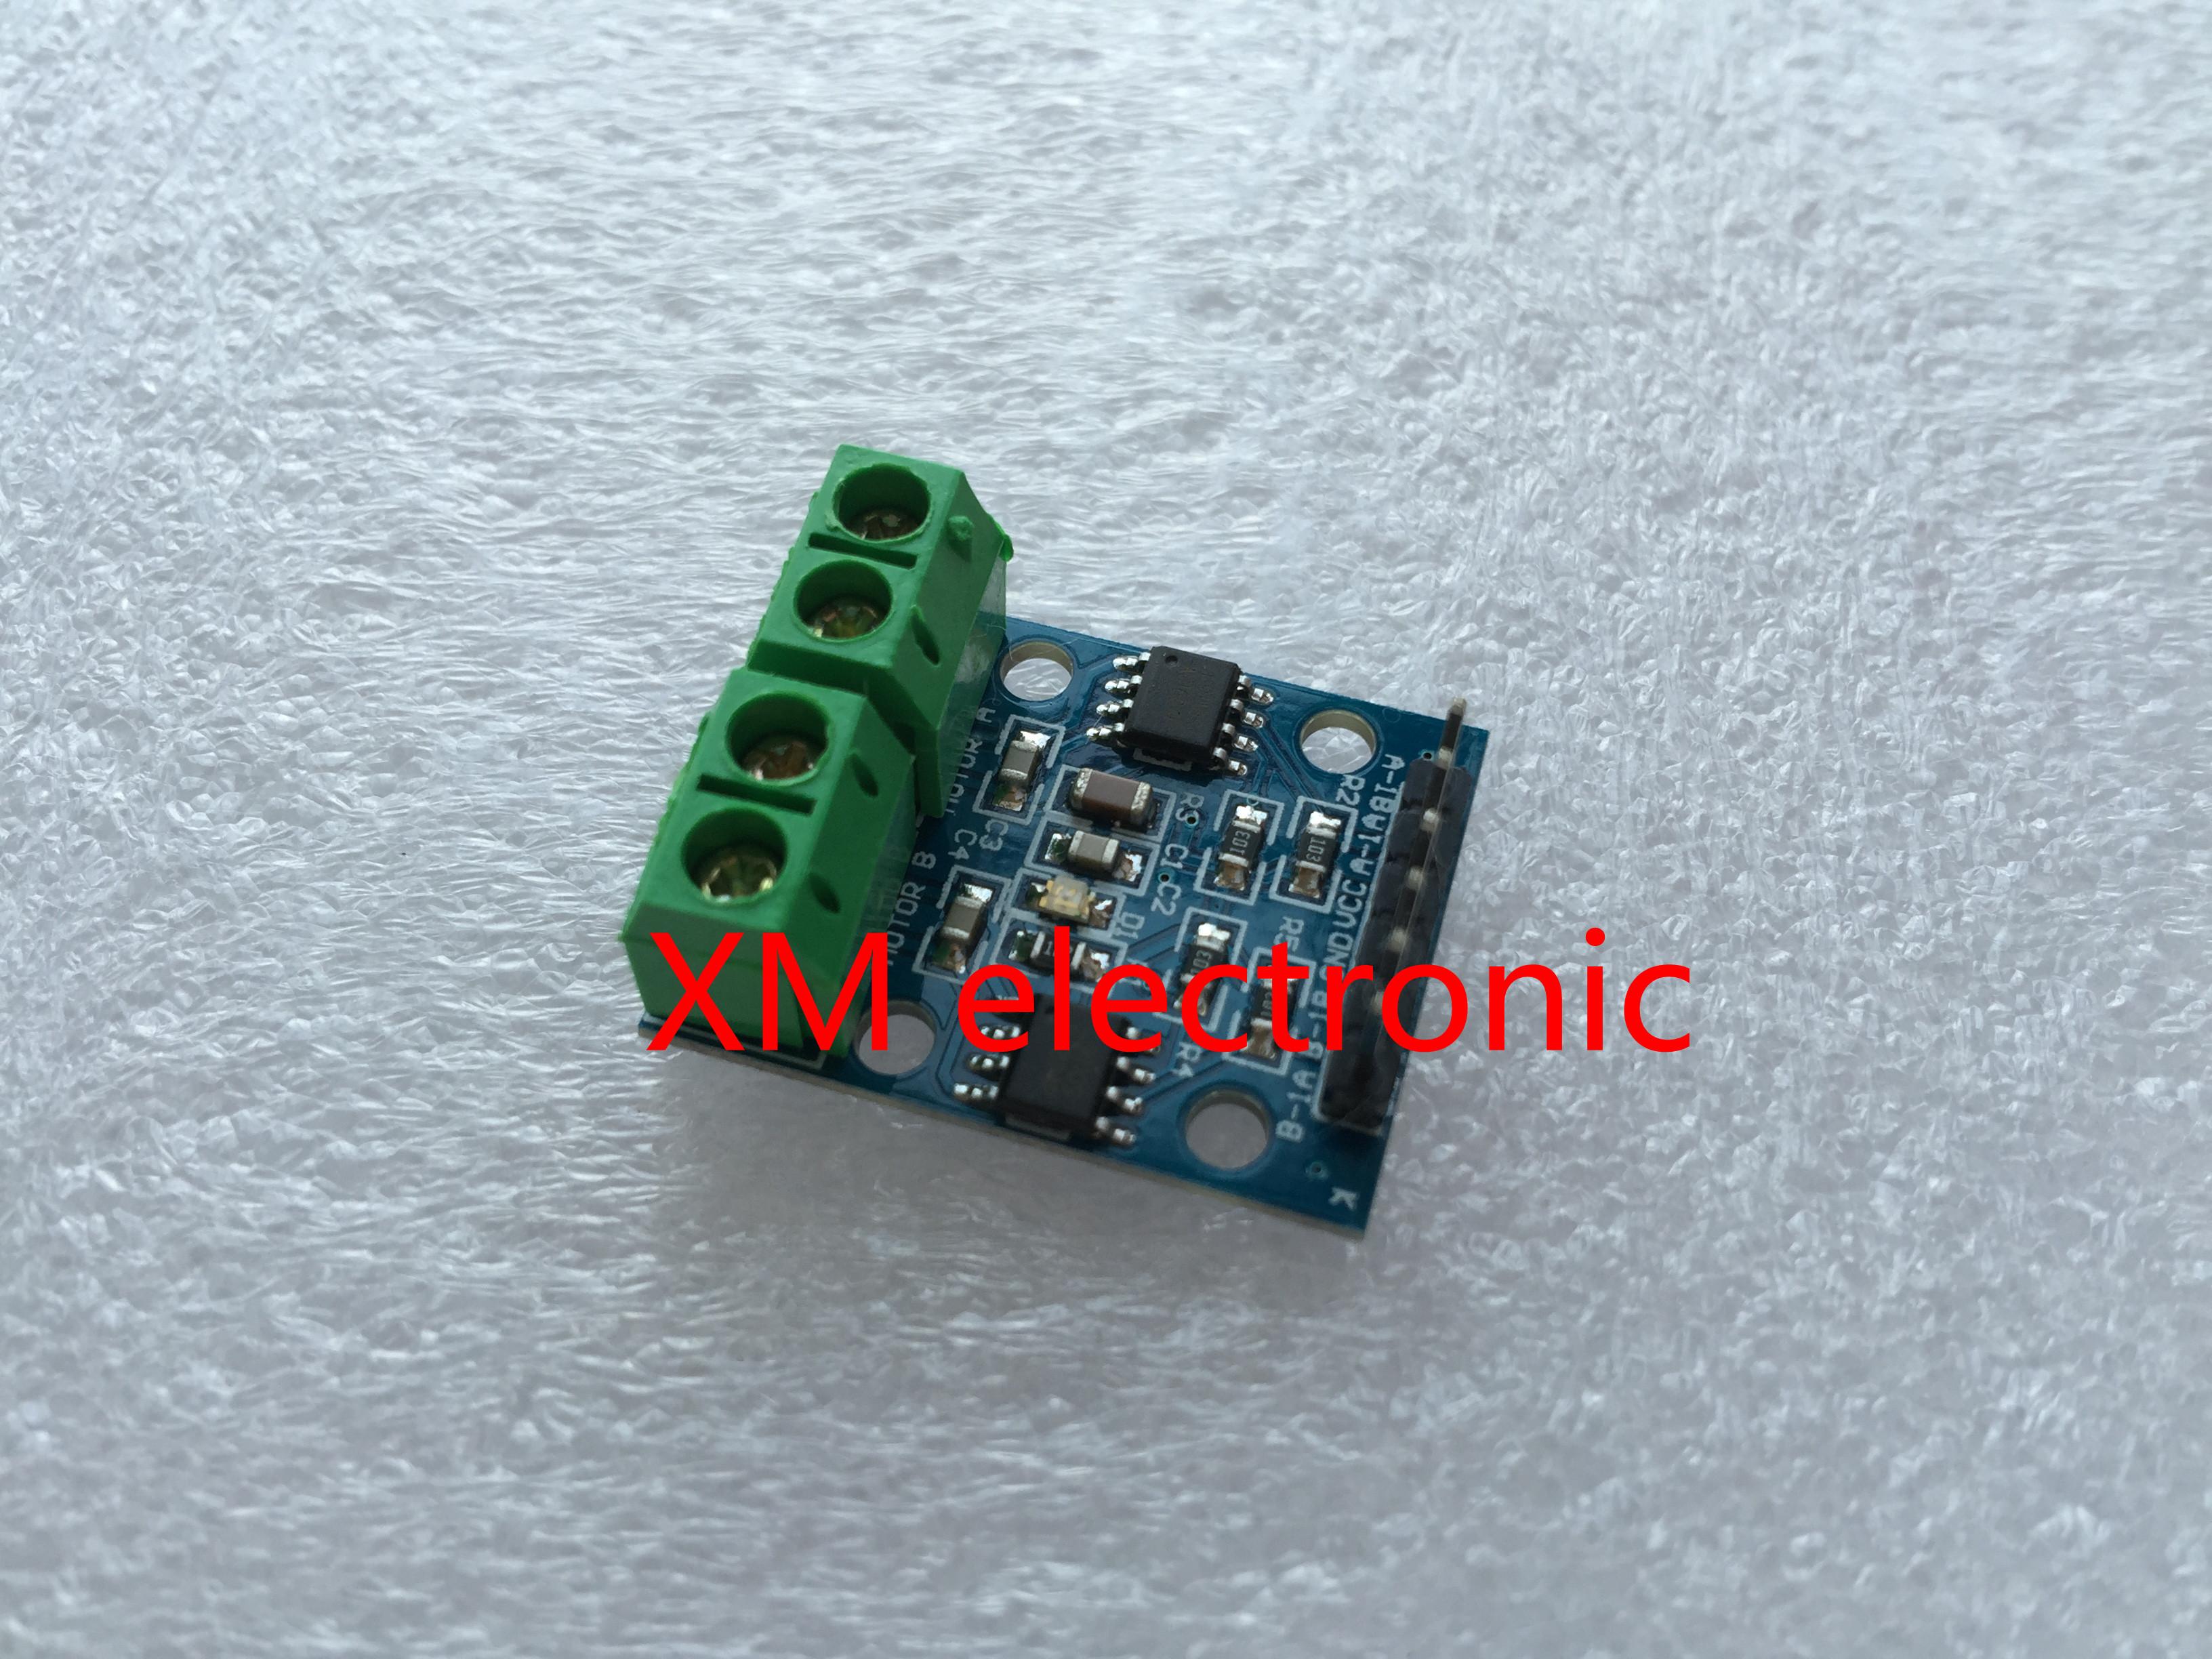 10pcs/lot L9110S DC Stepper Motor Driver Board H Bridge for Arduino Free Shipping Dropshipping(China (Mainland))